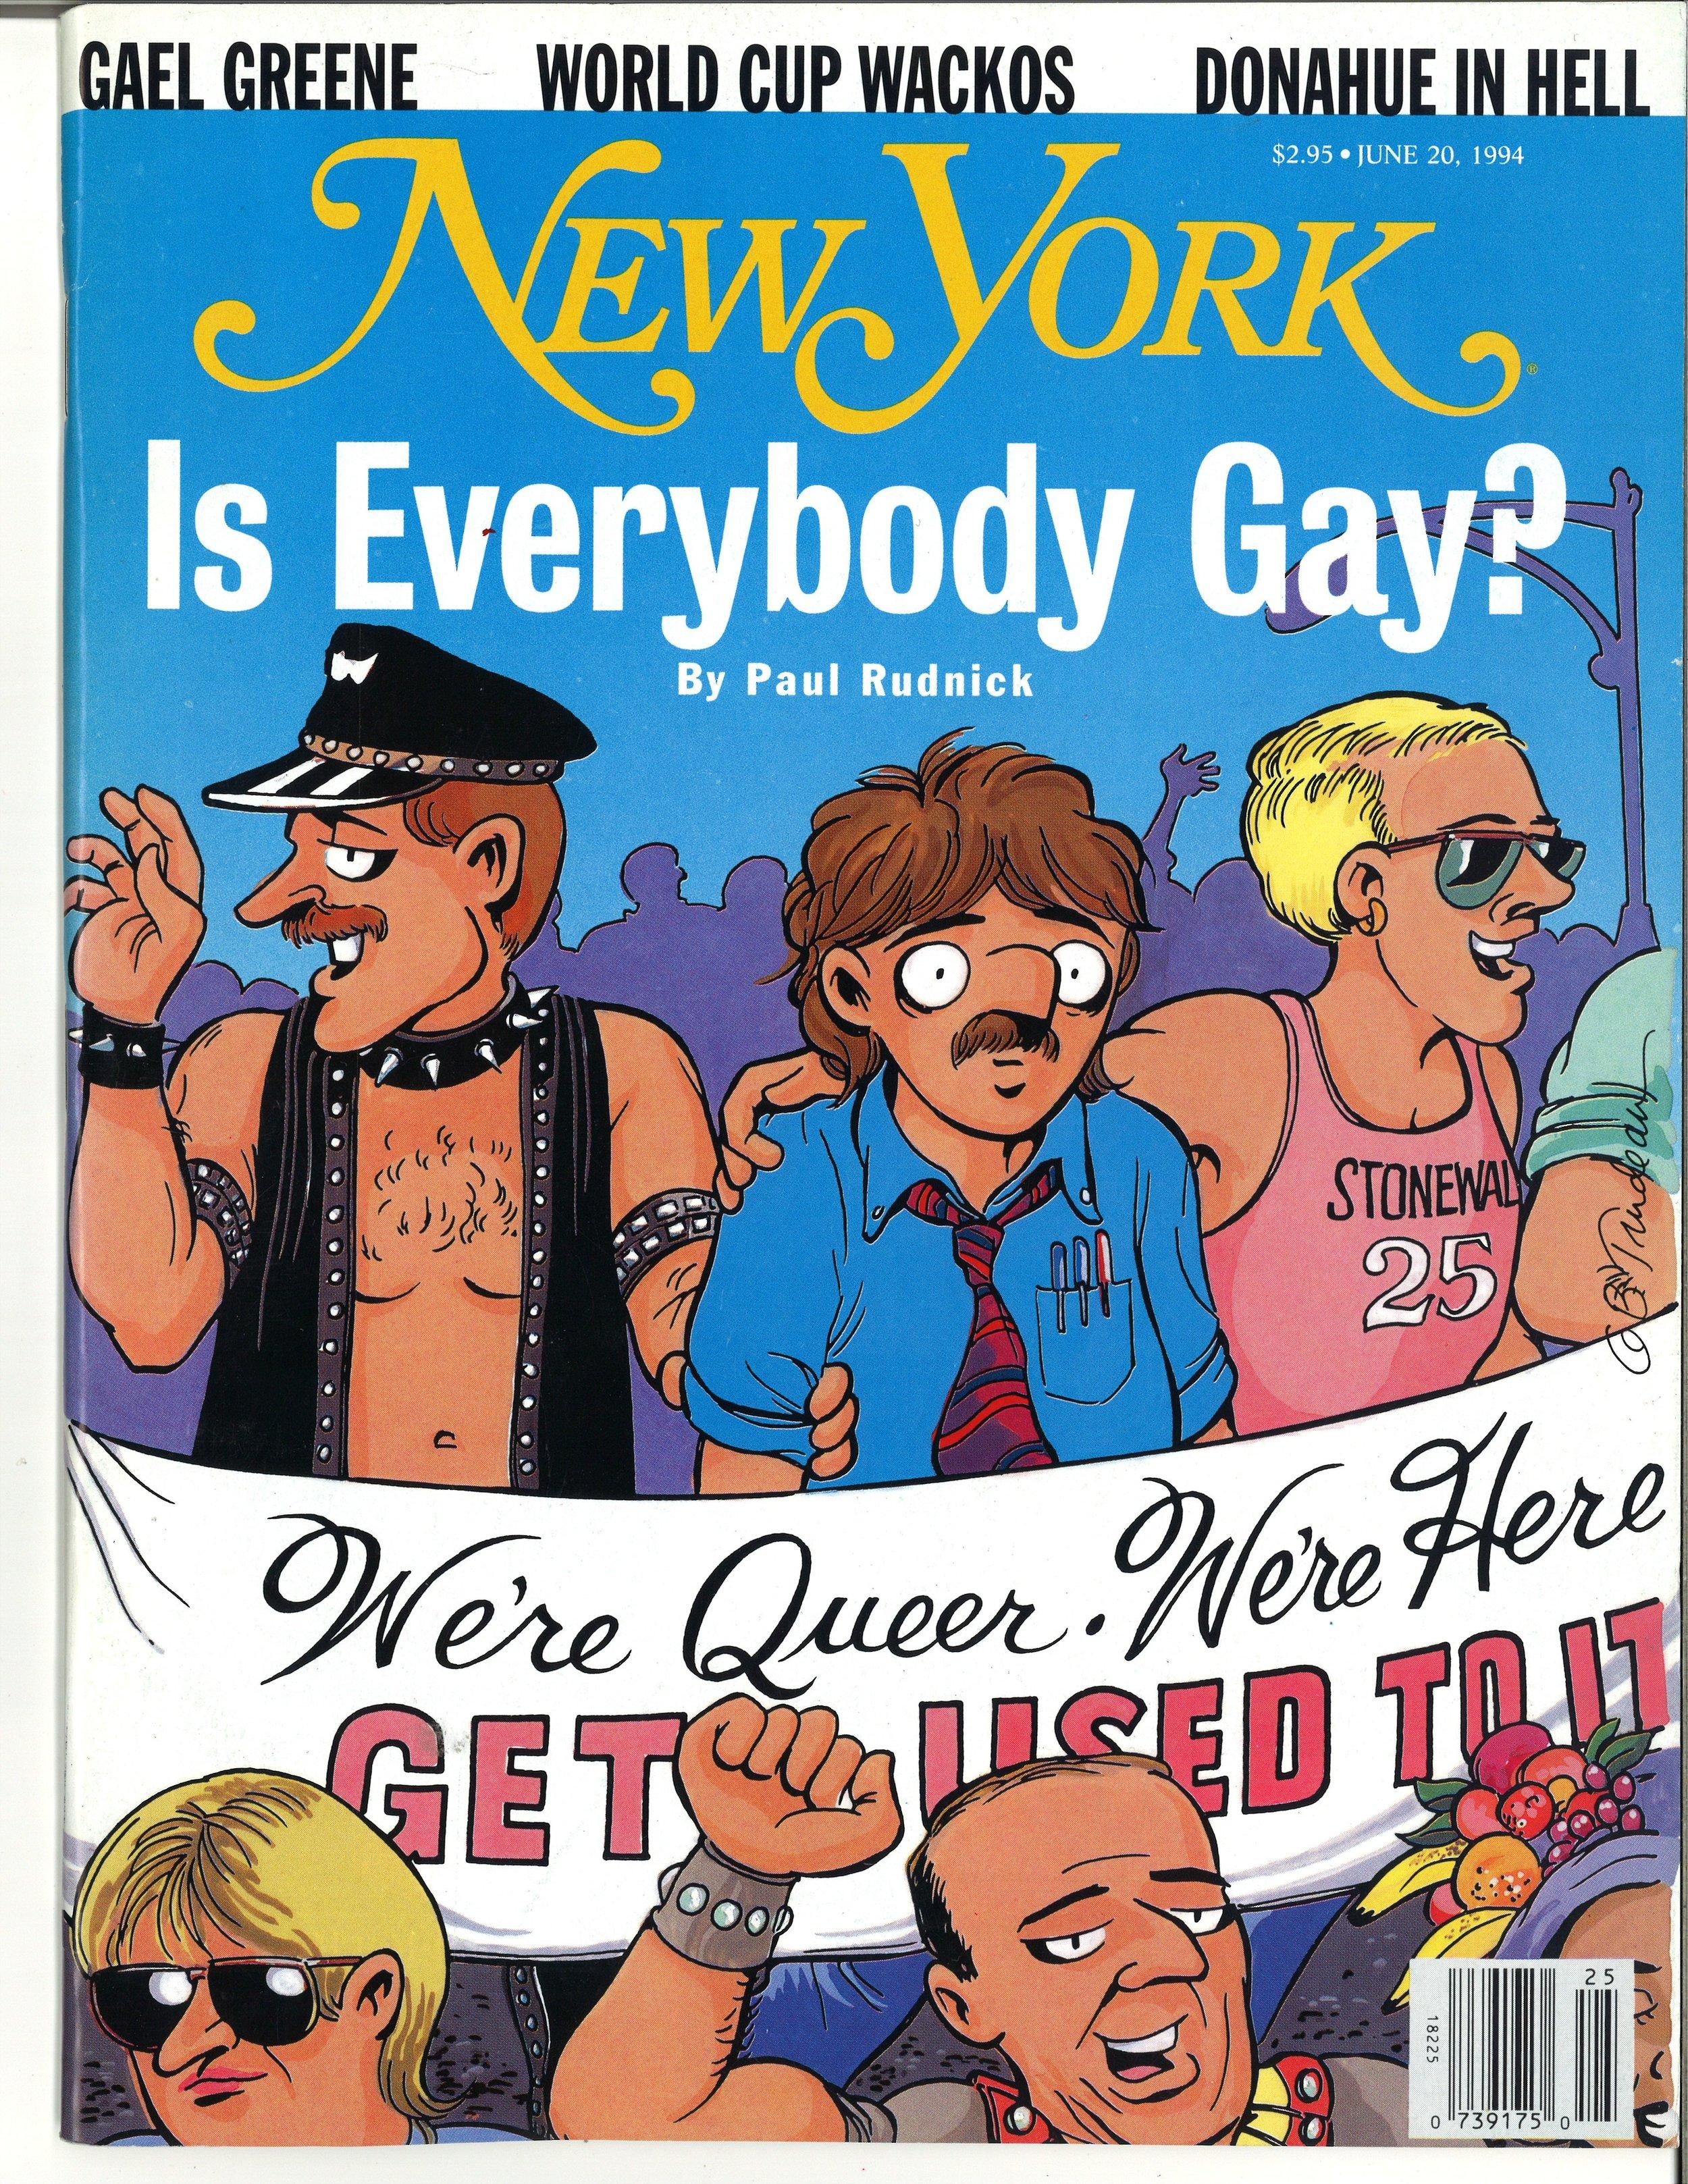 New York Magazine,June 20, 19941994Courtesy New York Magazine